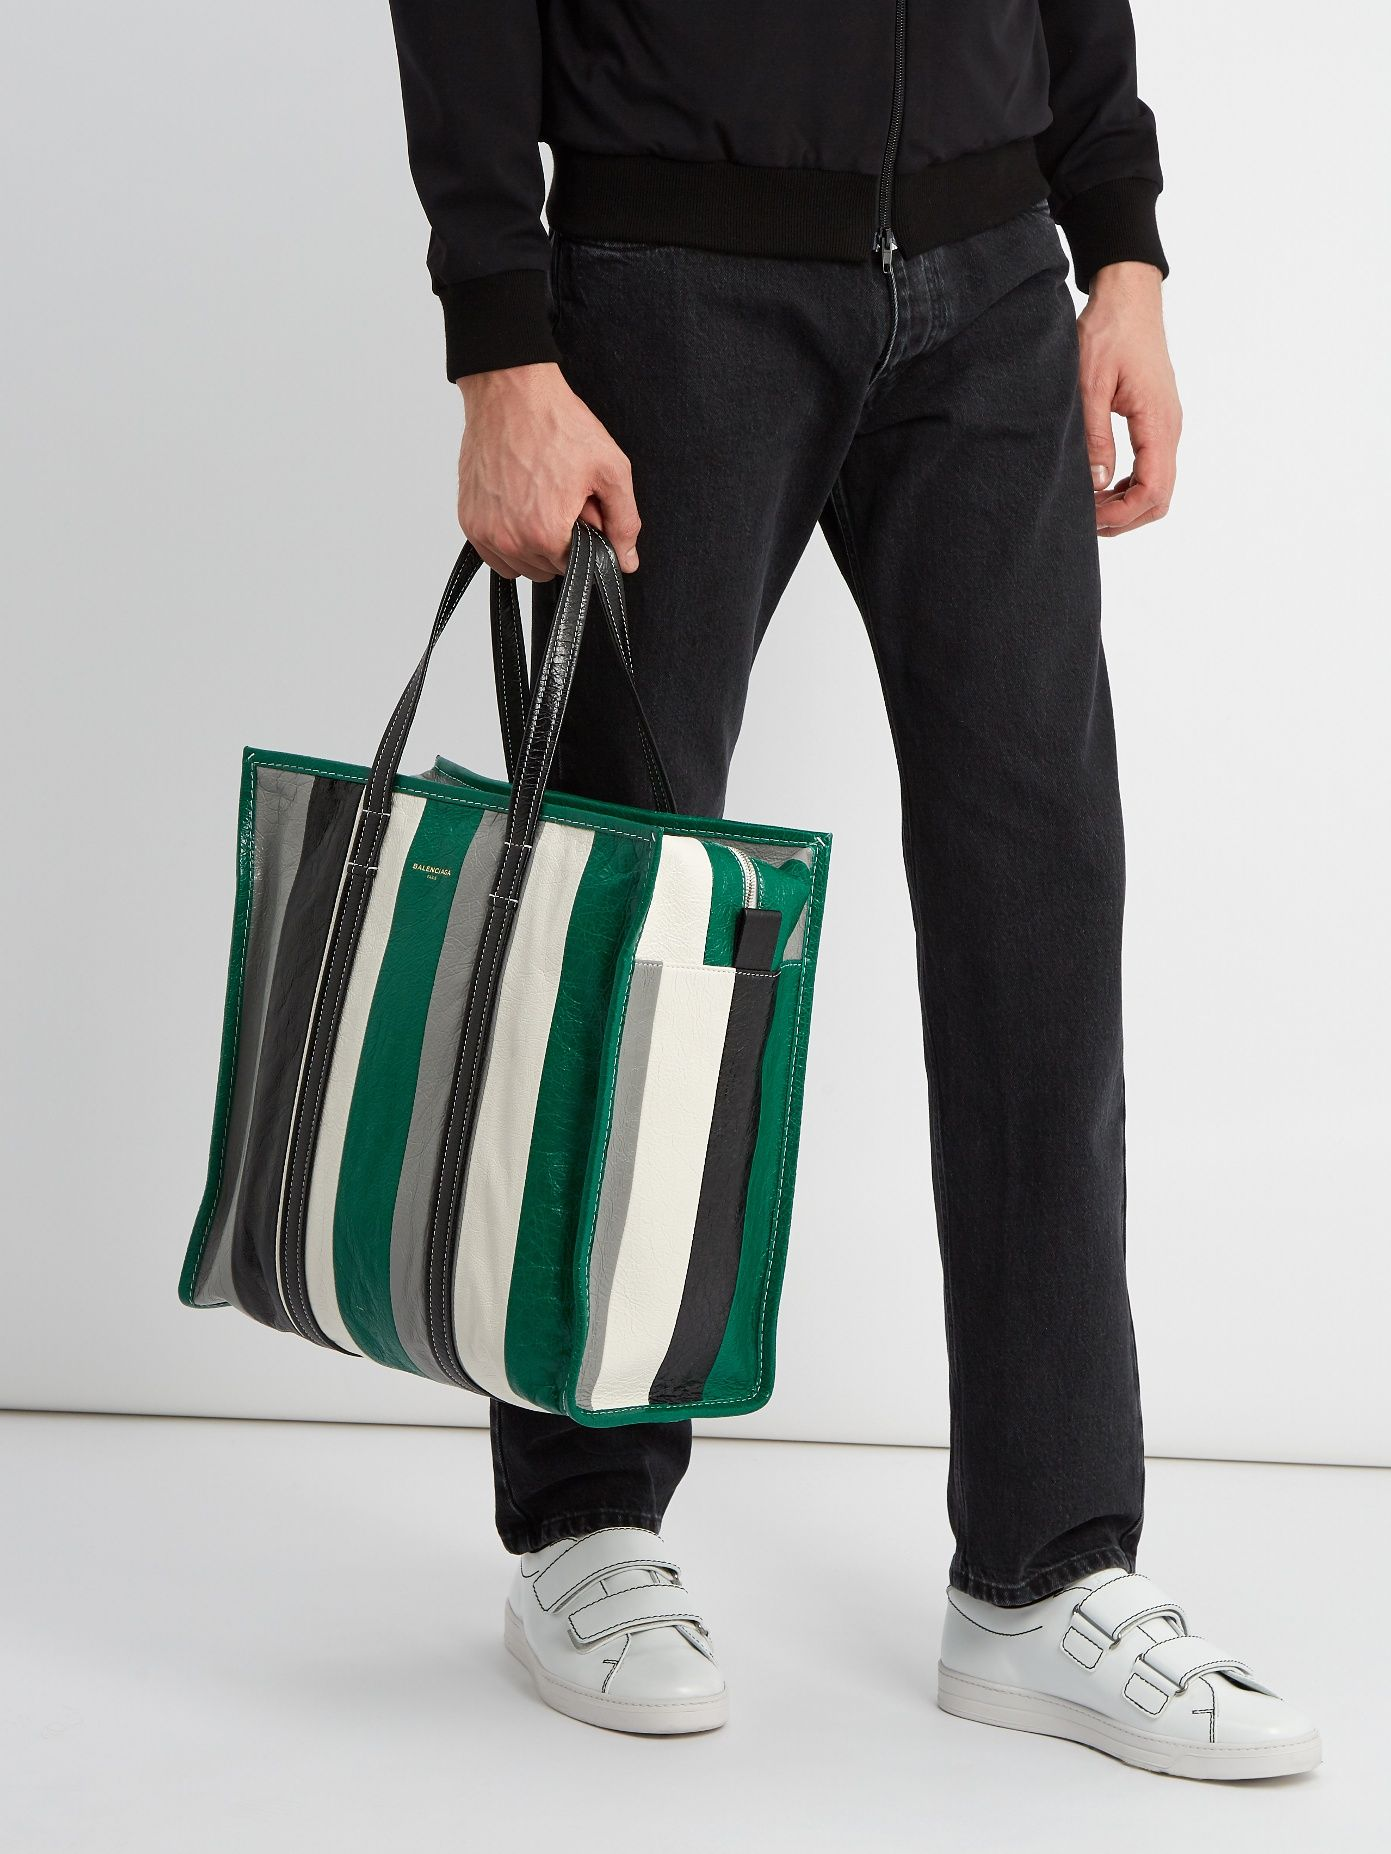 ea02ccf9b38f Click here to buy Balenciaga Bazar shopper M at MATCHESFASHION.COM ...